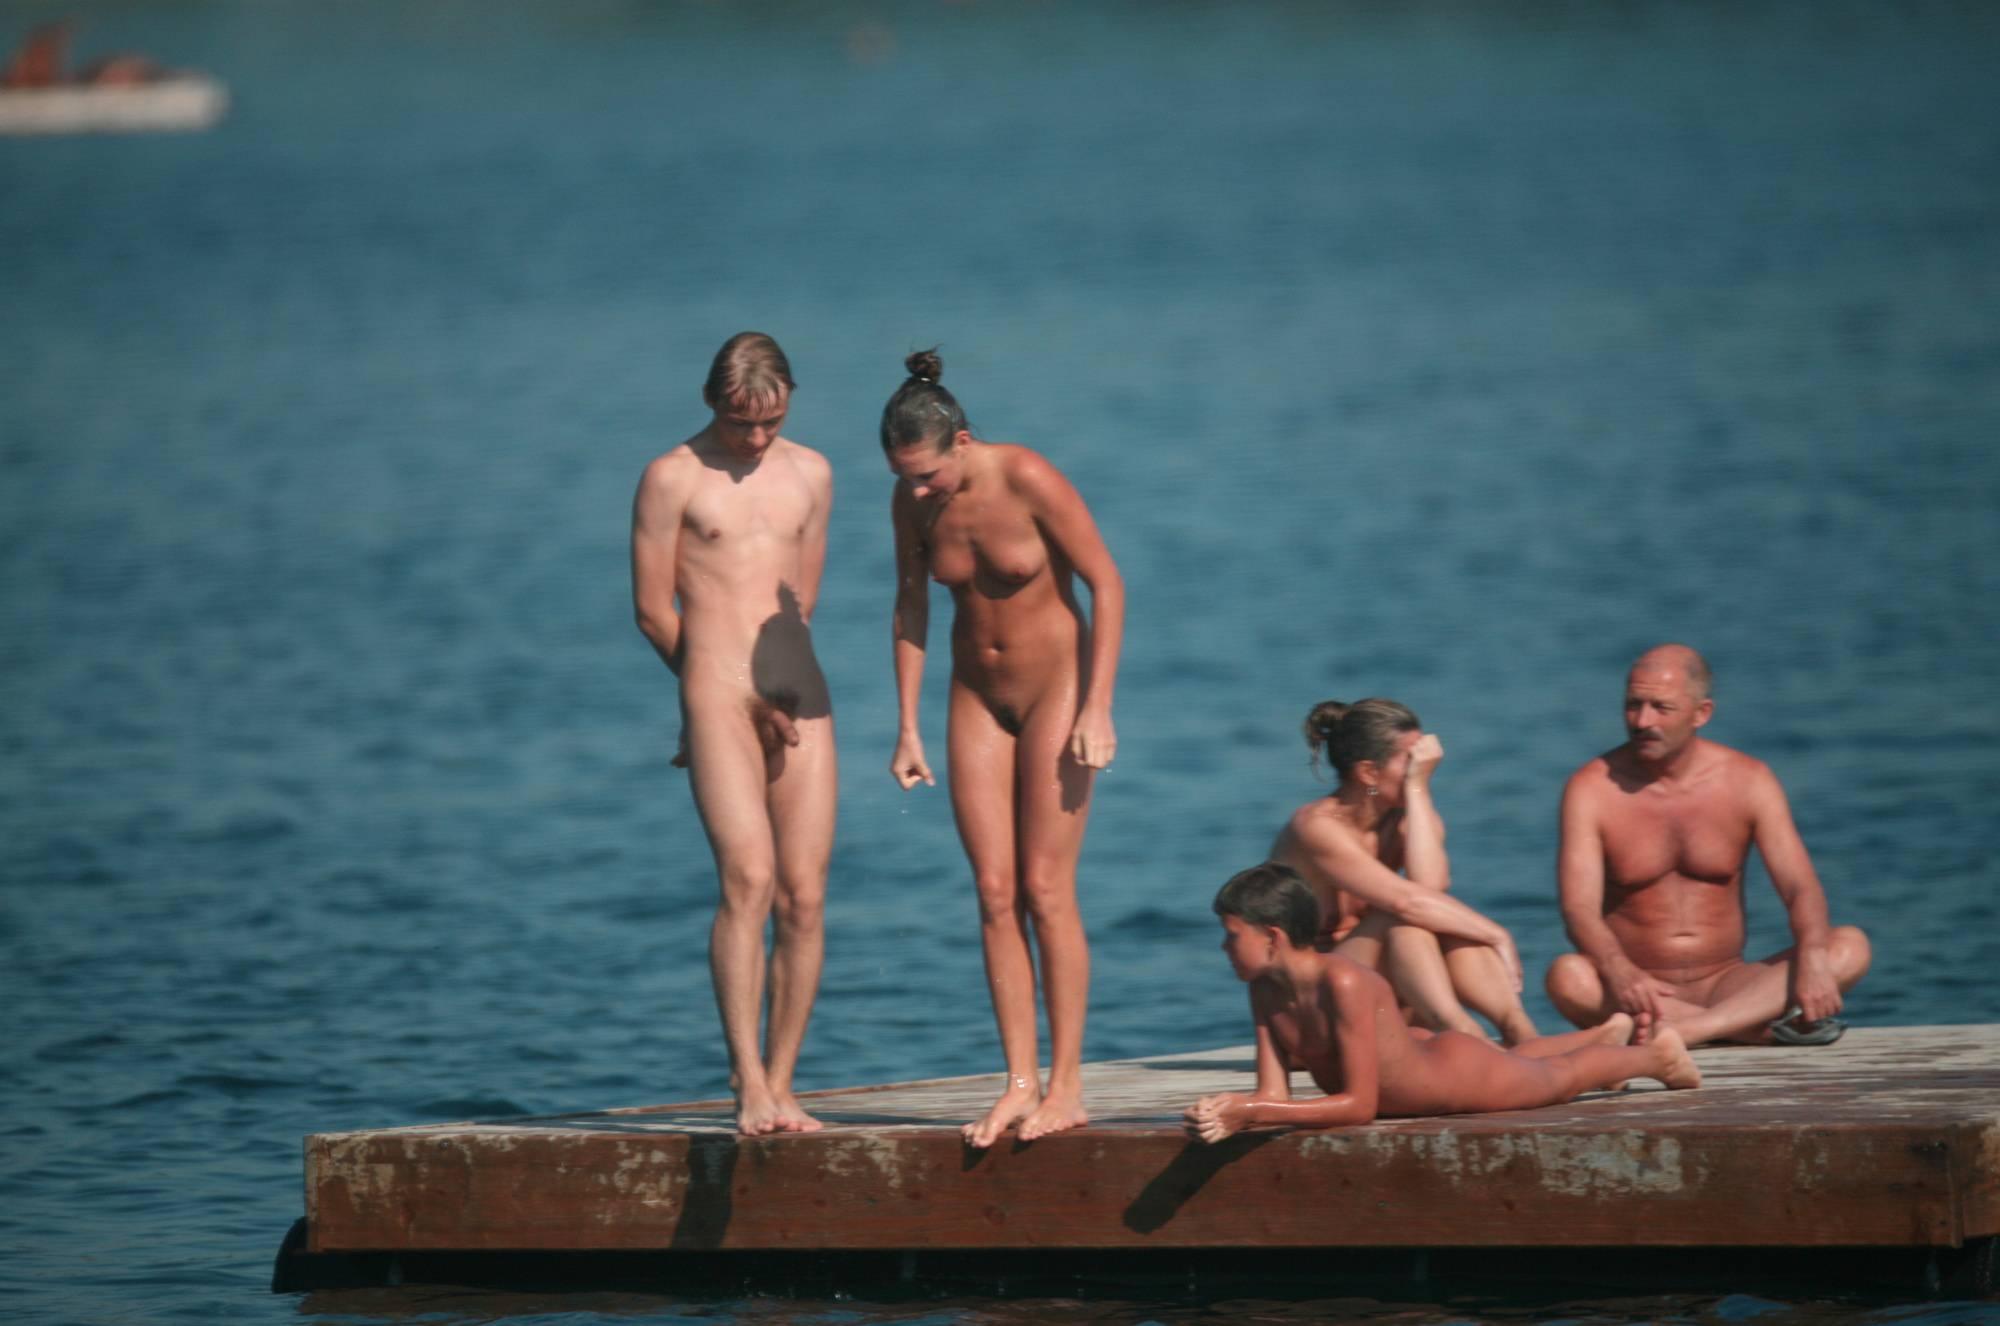 Nudist Pics Naturist Family Water Slab - 1